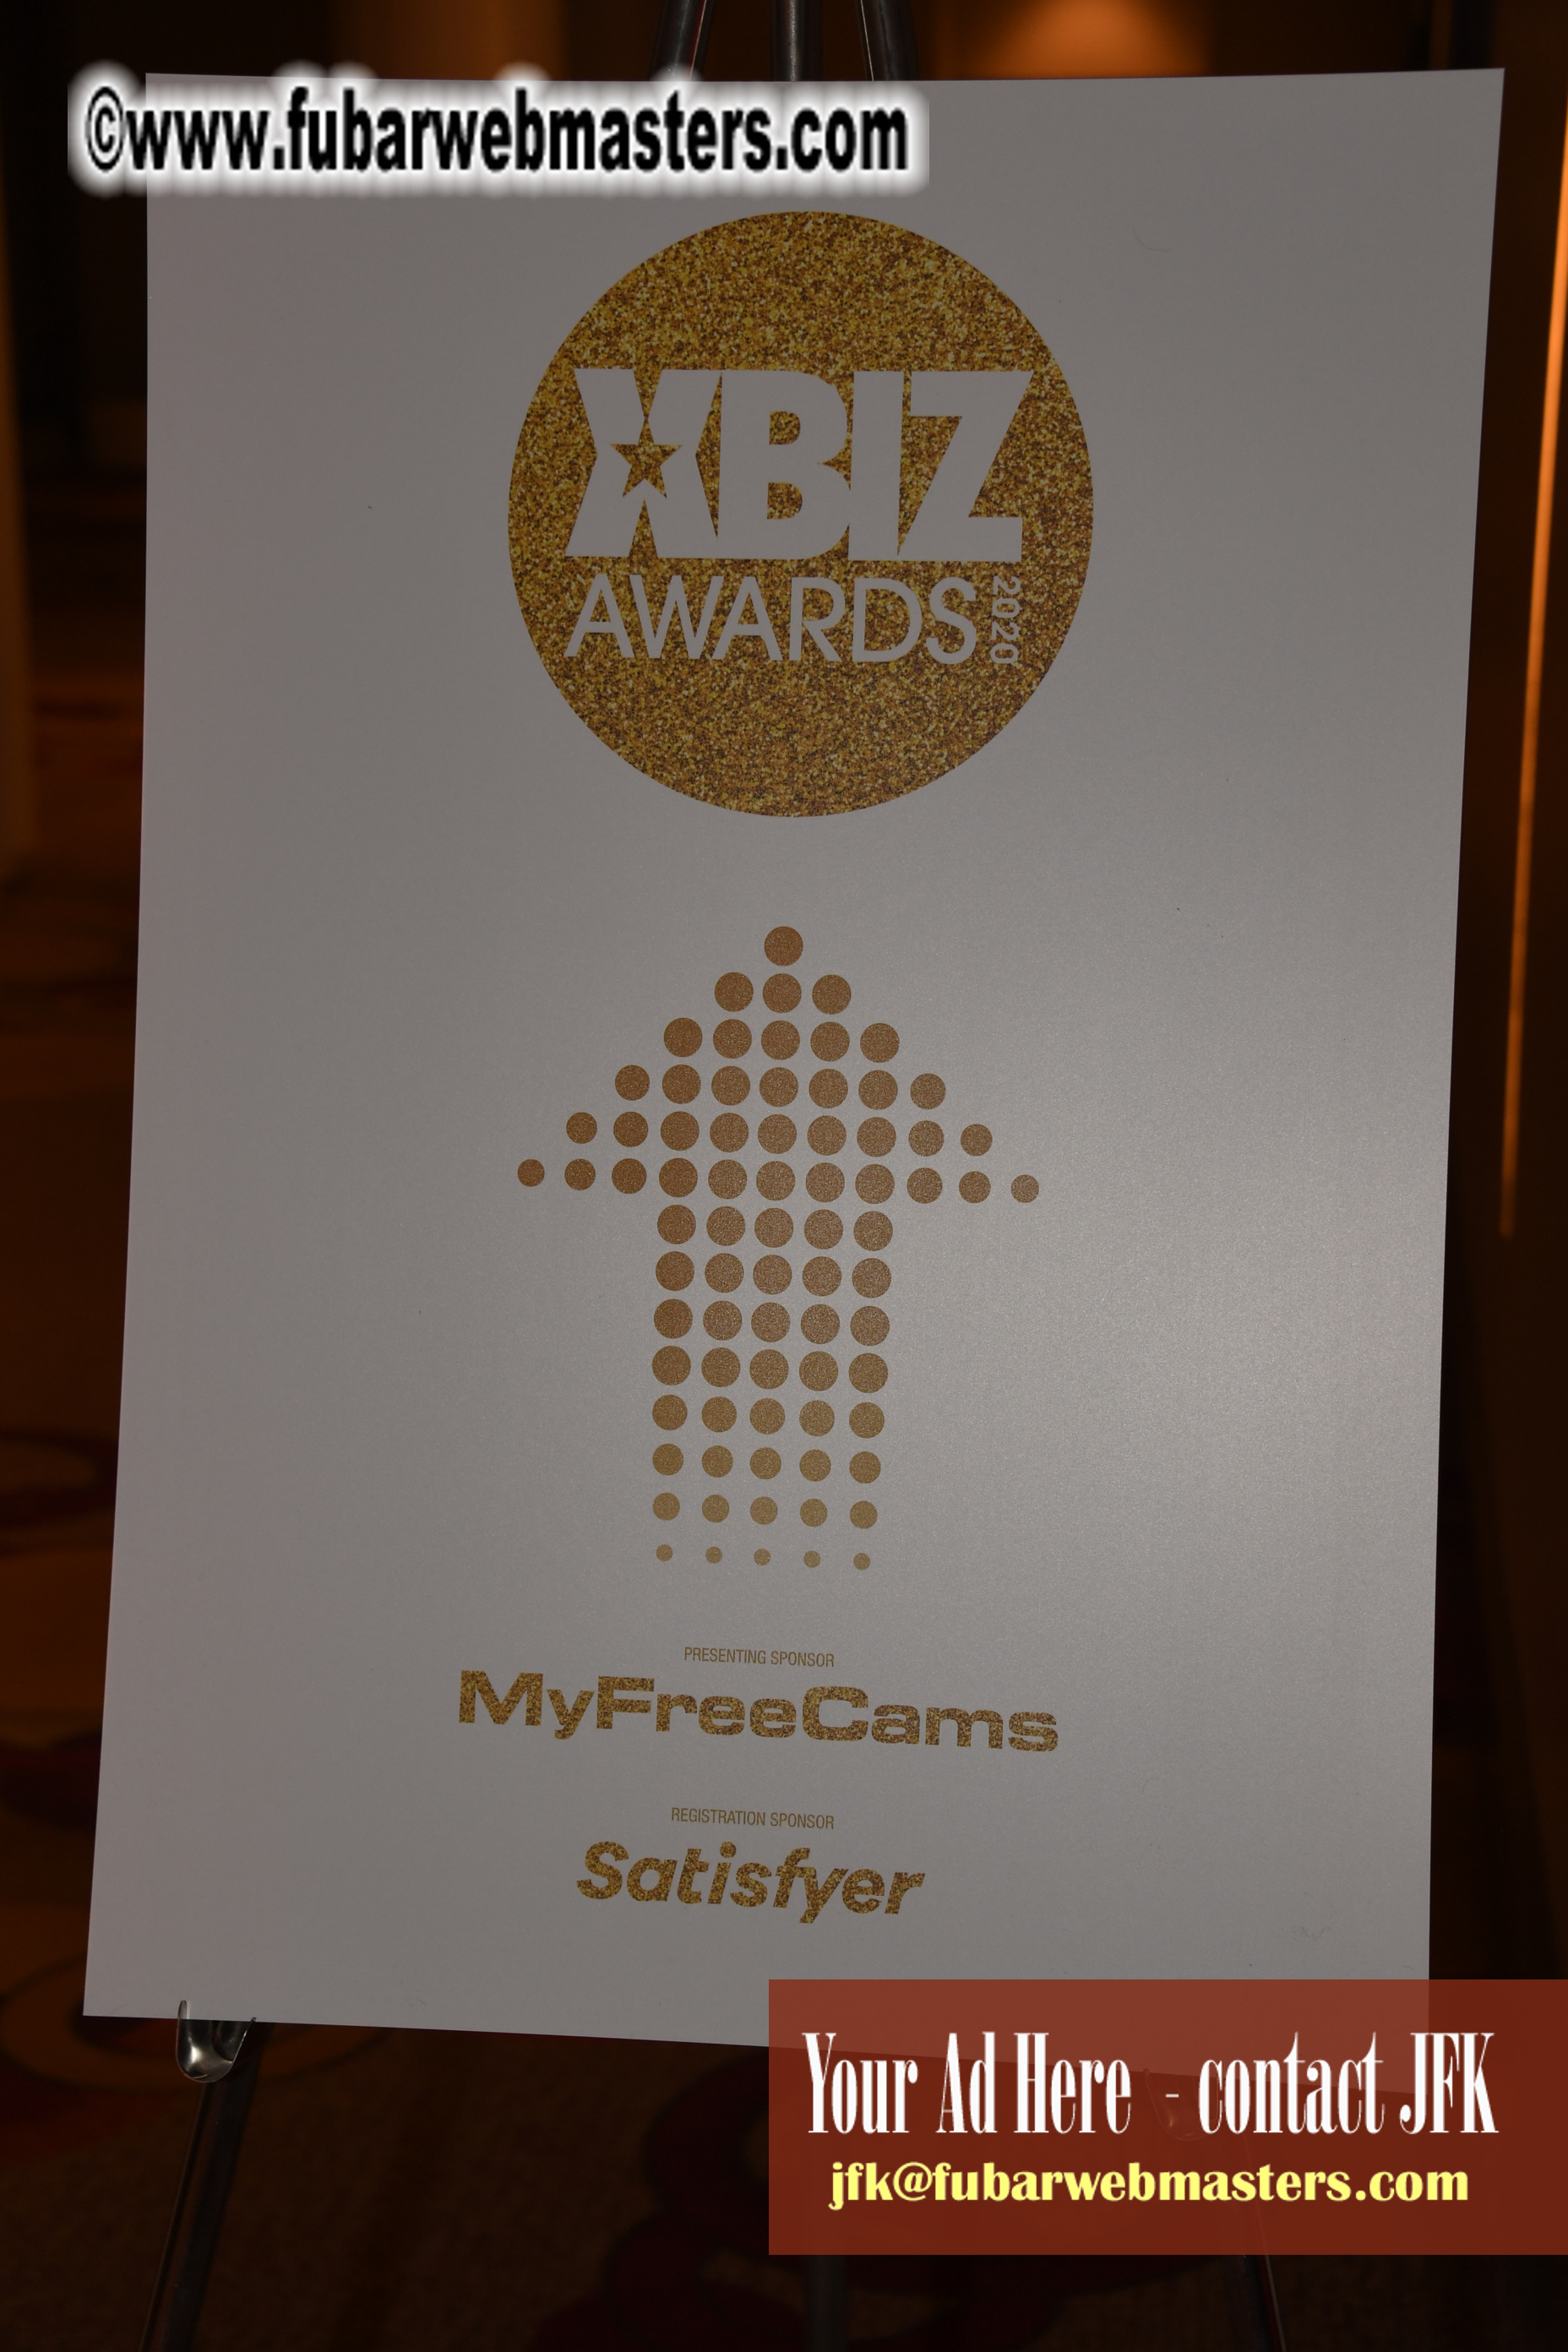 XBIZ Awards Red Carpet 2020